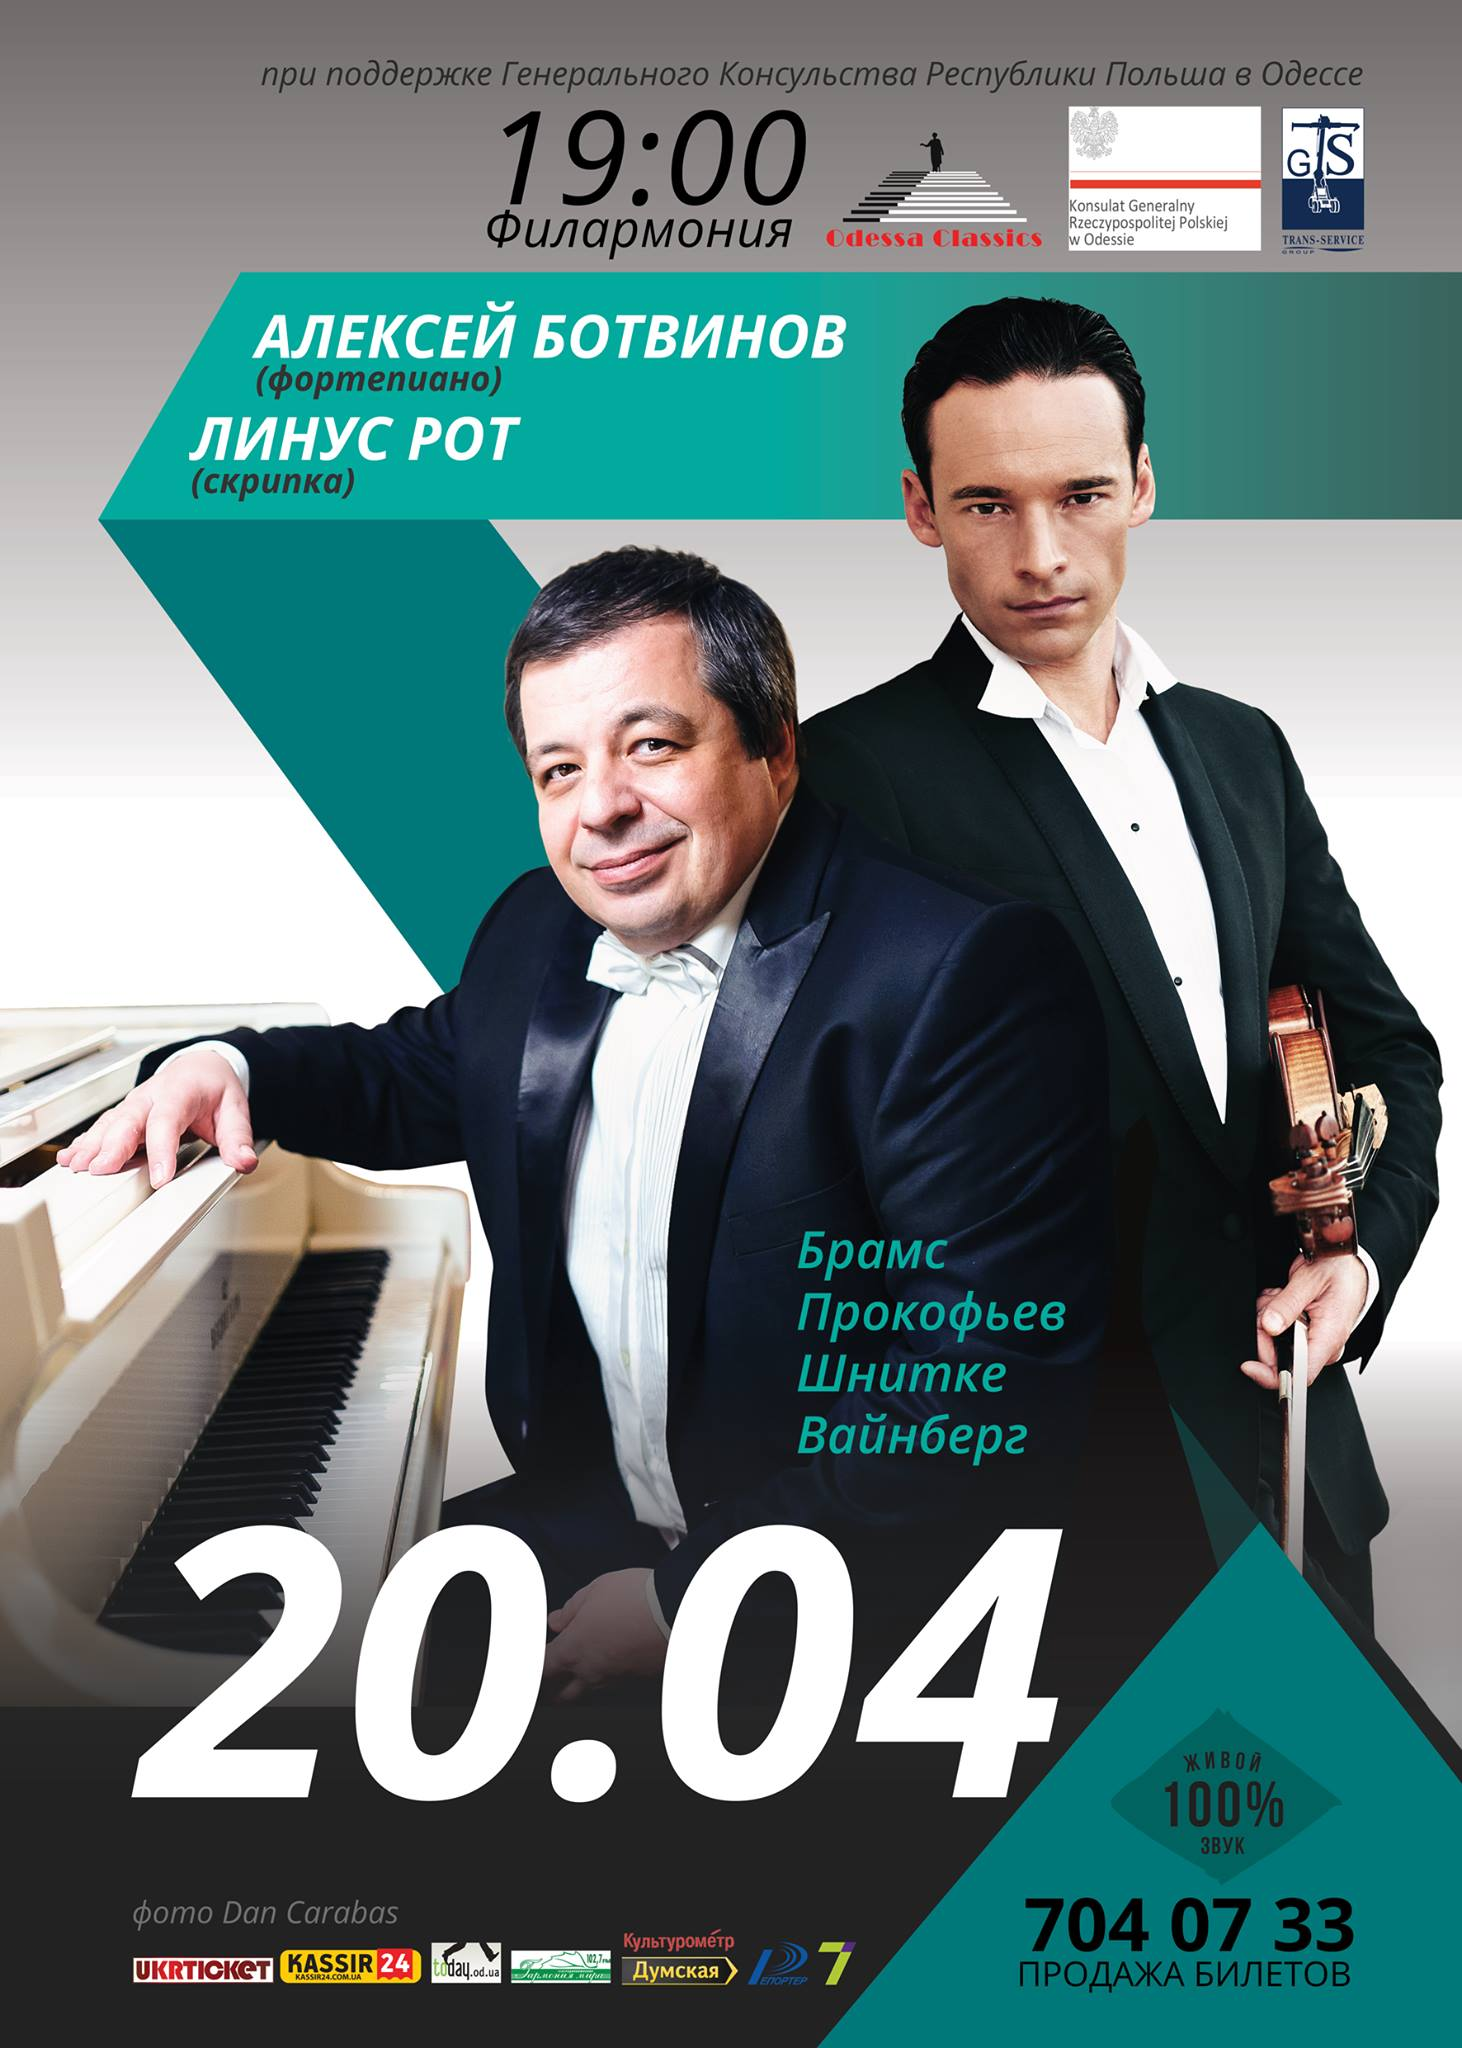 Линус Рот и Алексей Ботвинов